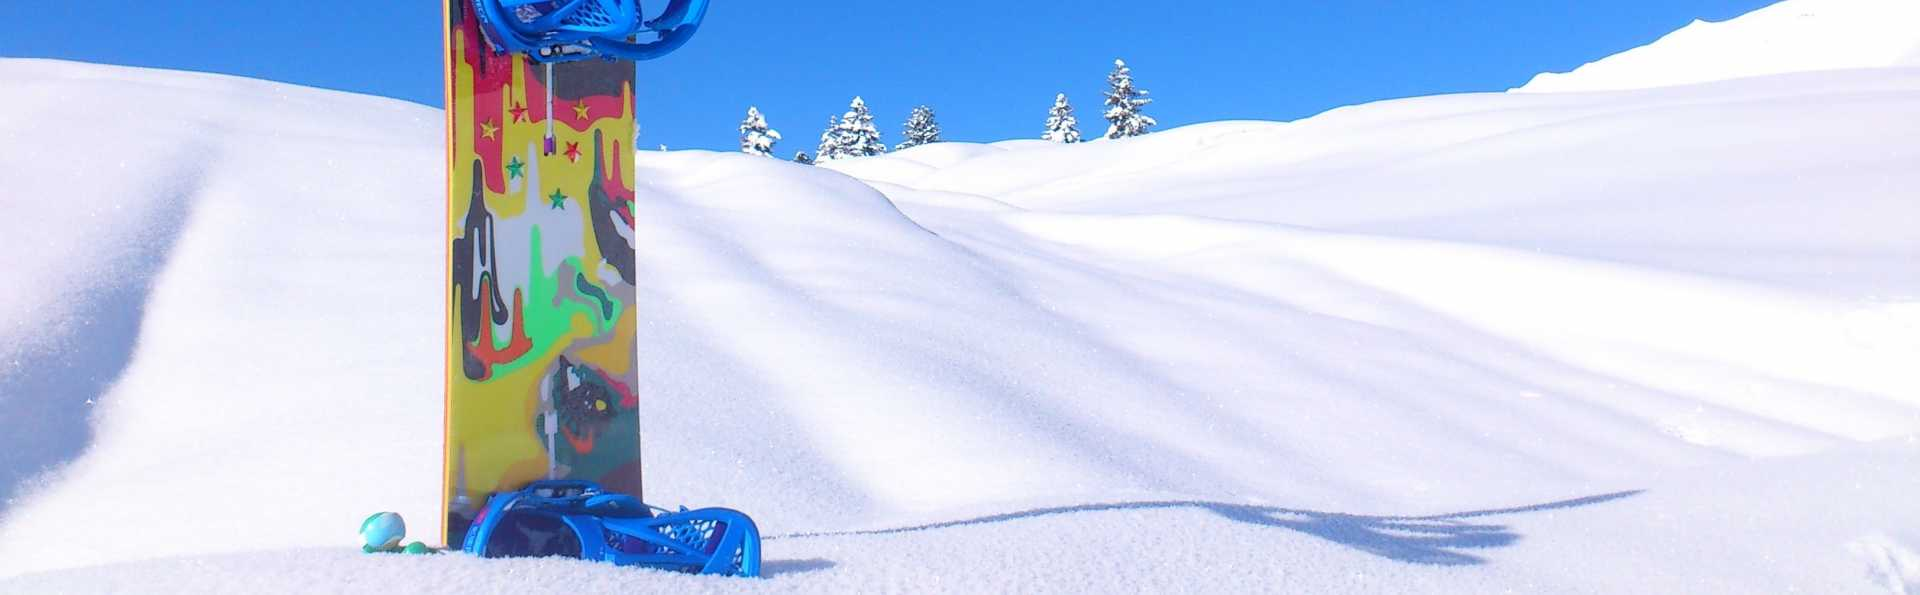 mountain-snow-cold-winter-sky-sun-1126497-pxhere.com